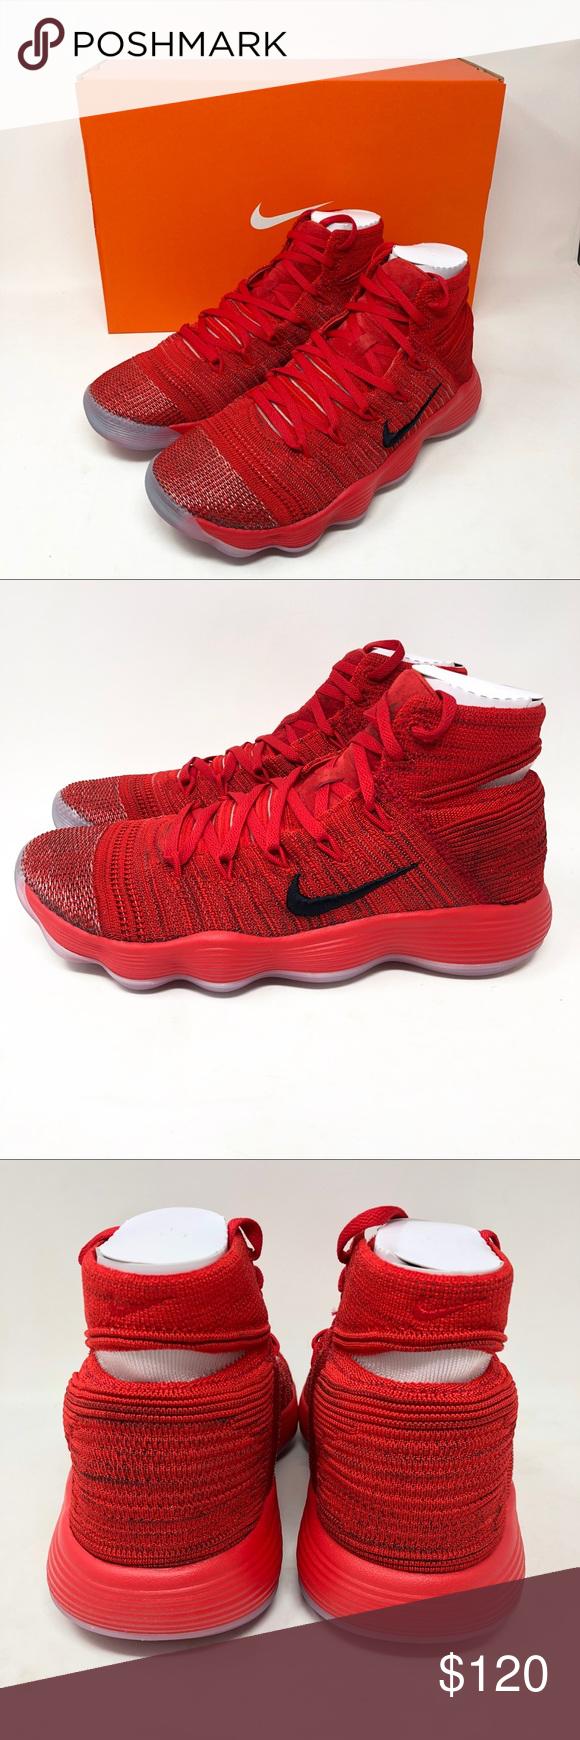 7005d7308b0b Nike Hyperdunk 2017 Flyknit University Red Sneaker Nike Hyperdunk Men s size  8.5 2017 Flyknit University Red